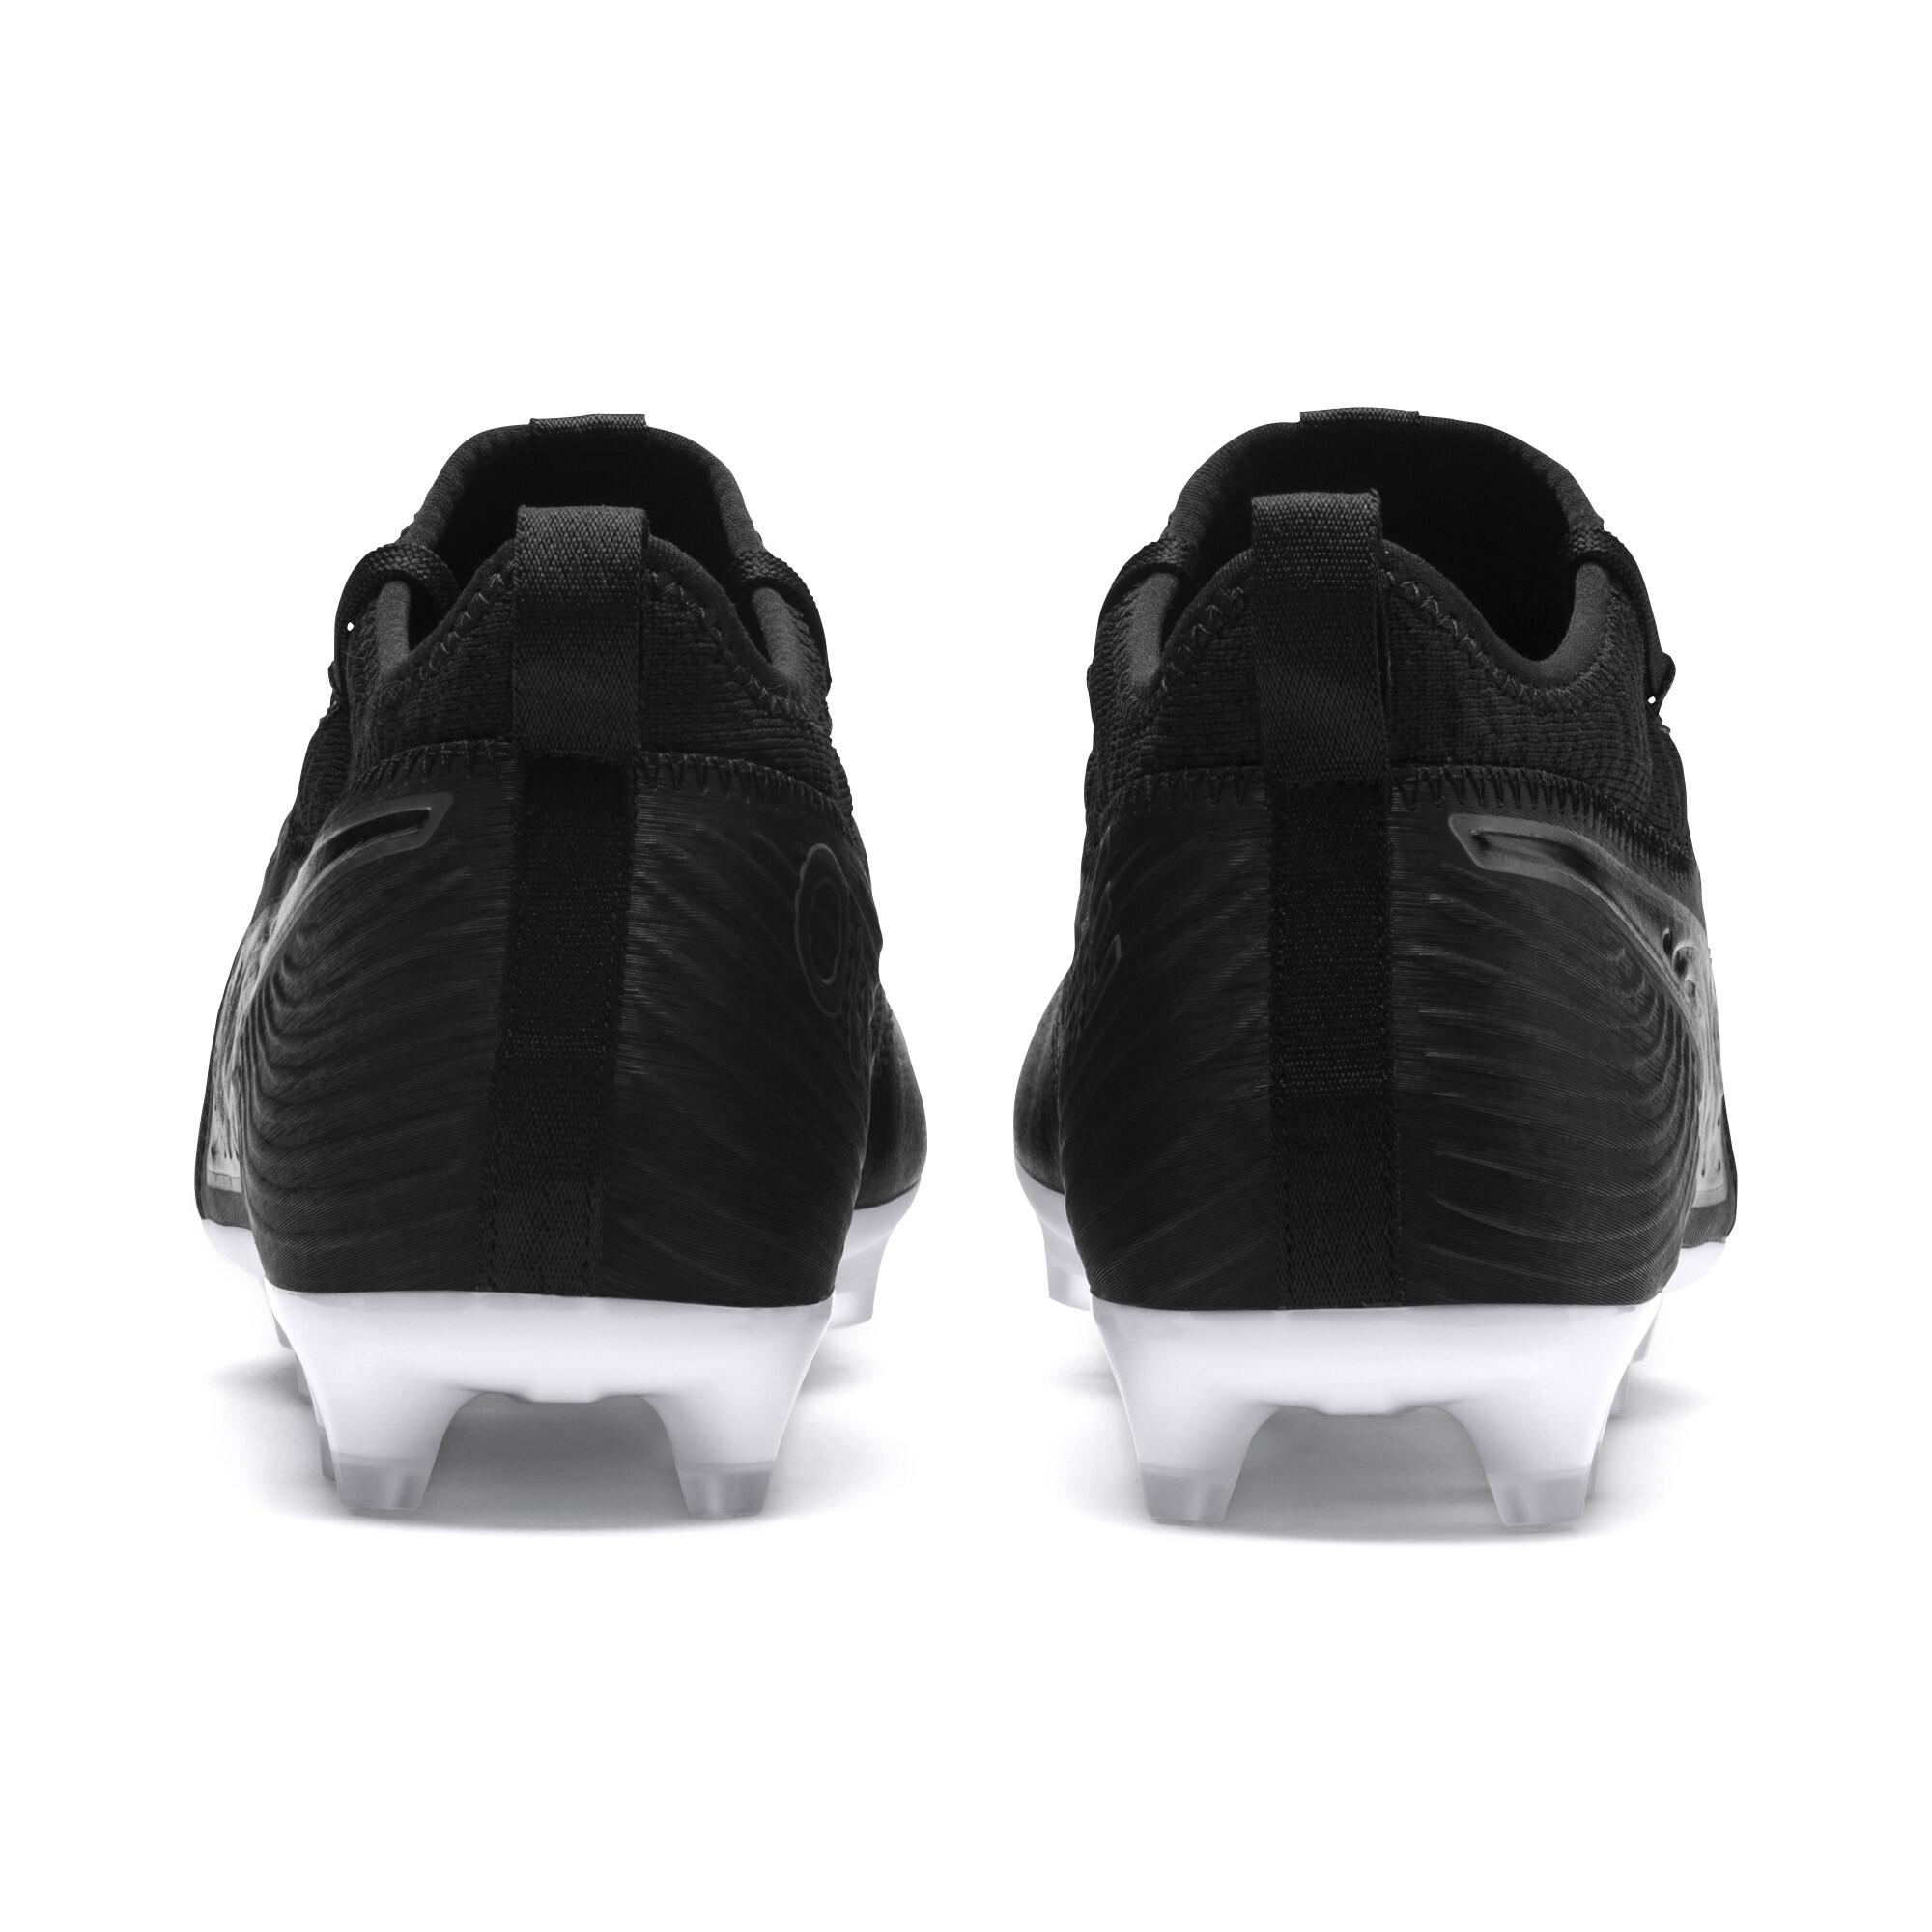 Image Puma PUMA ONE 19.3 FG/AG Men's Football Boots #3